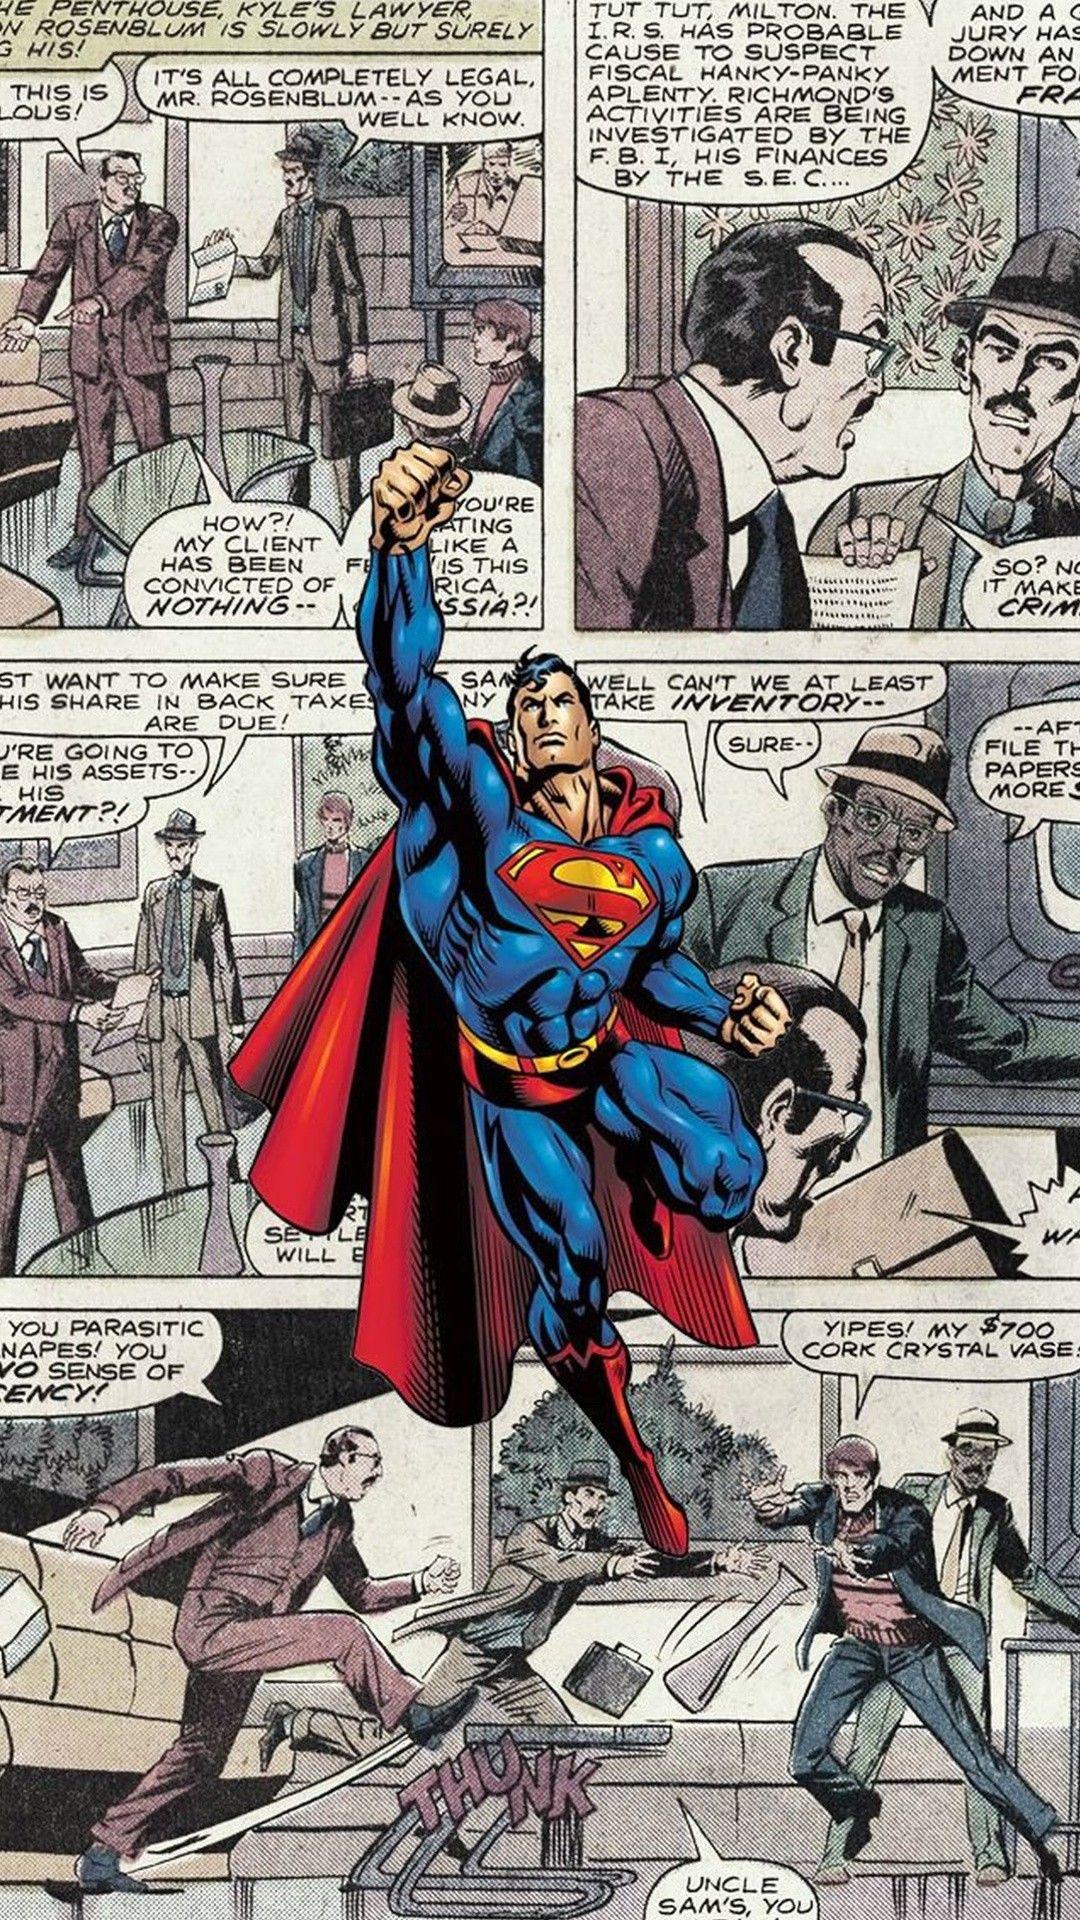 Pin by Joe Smith on SUPERMAN The All-Time Hero | Superman comic